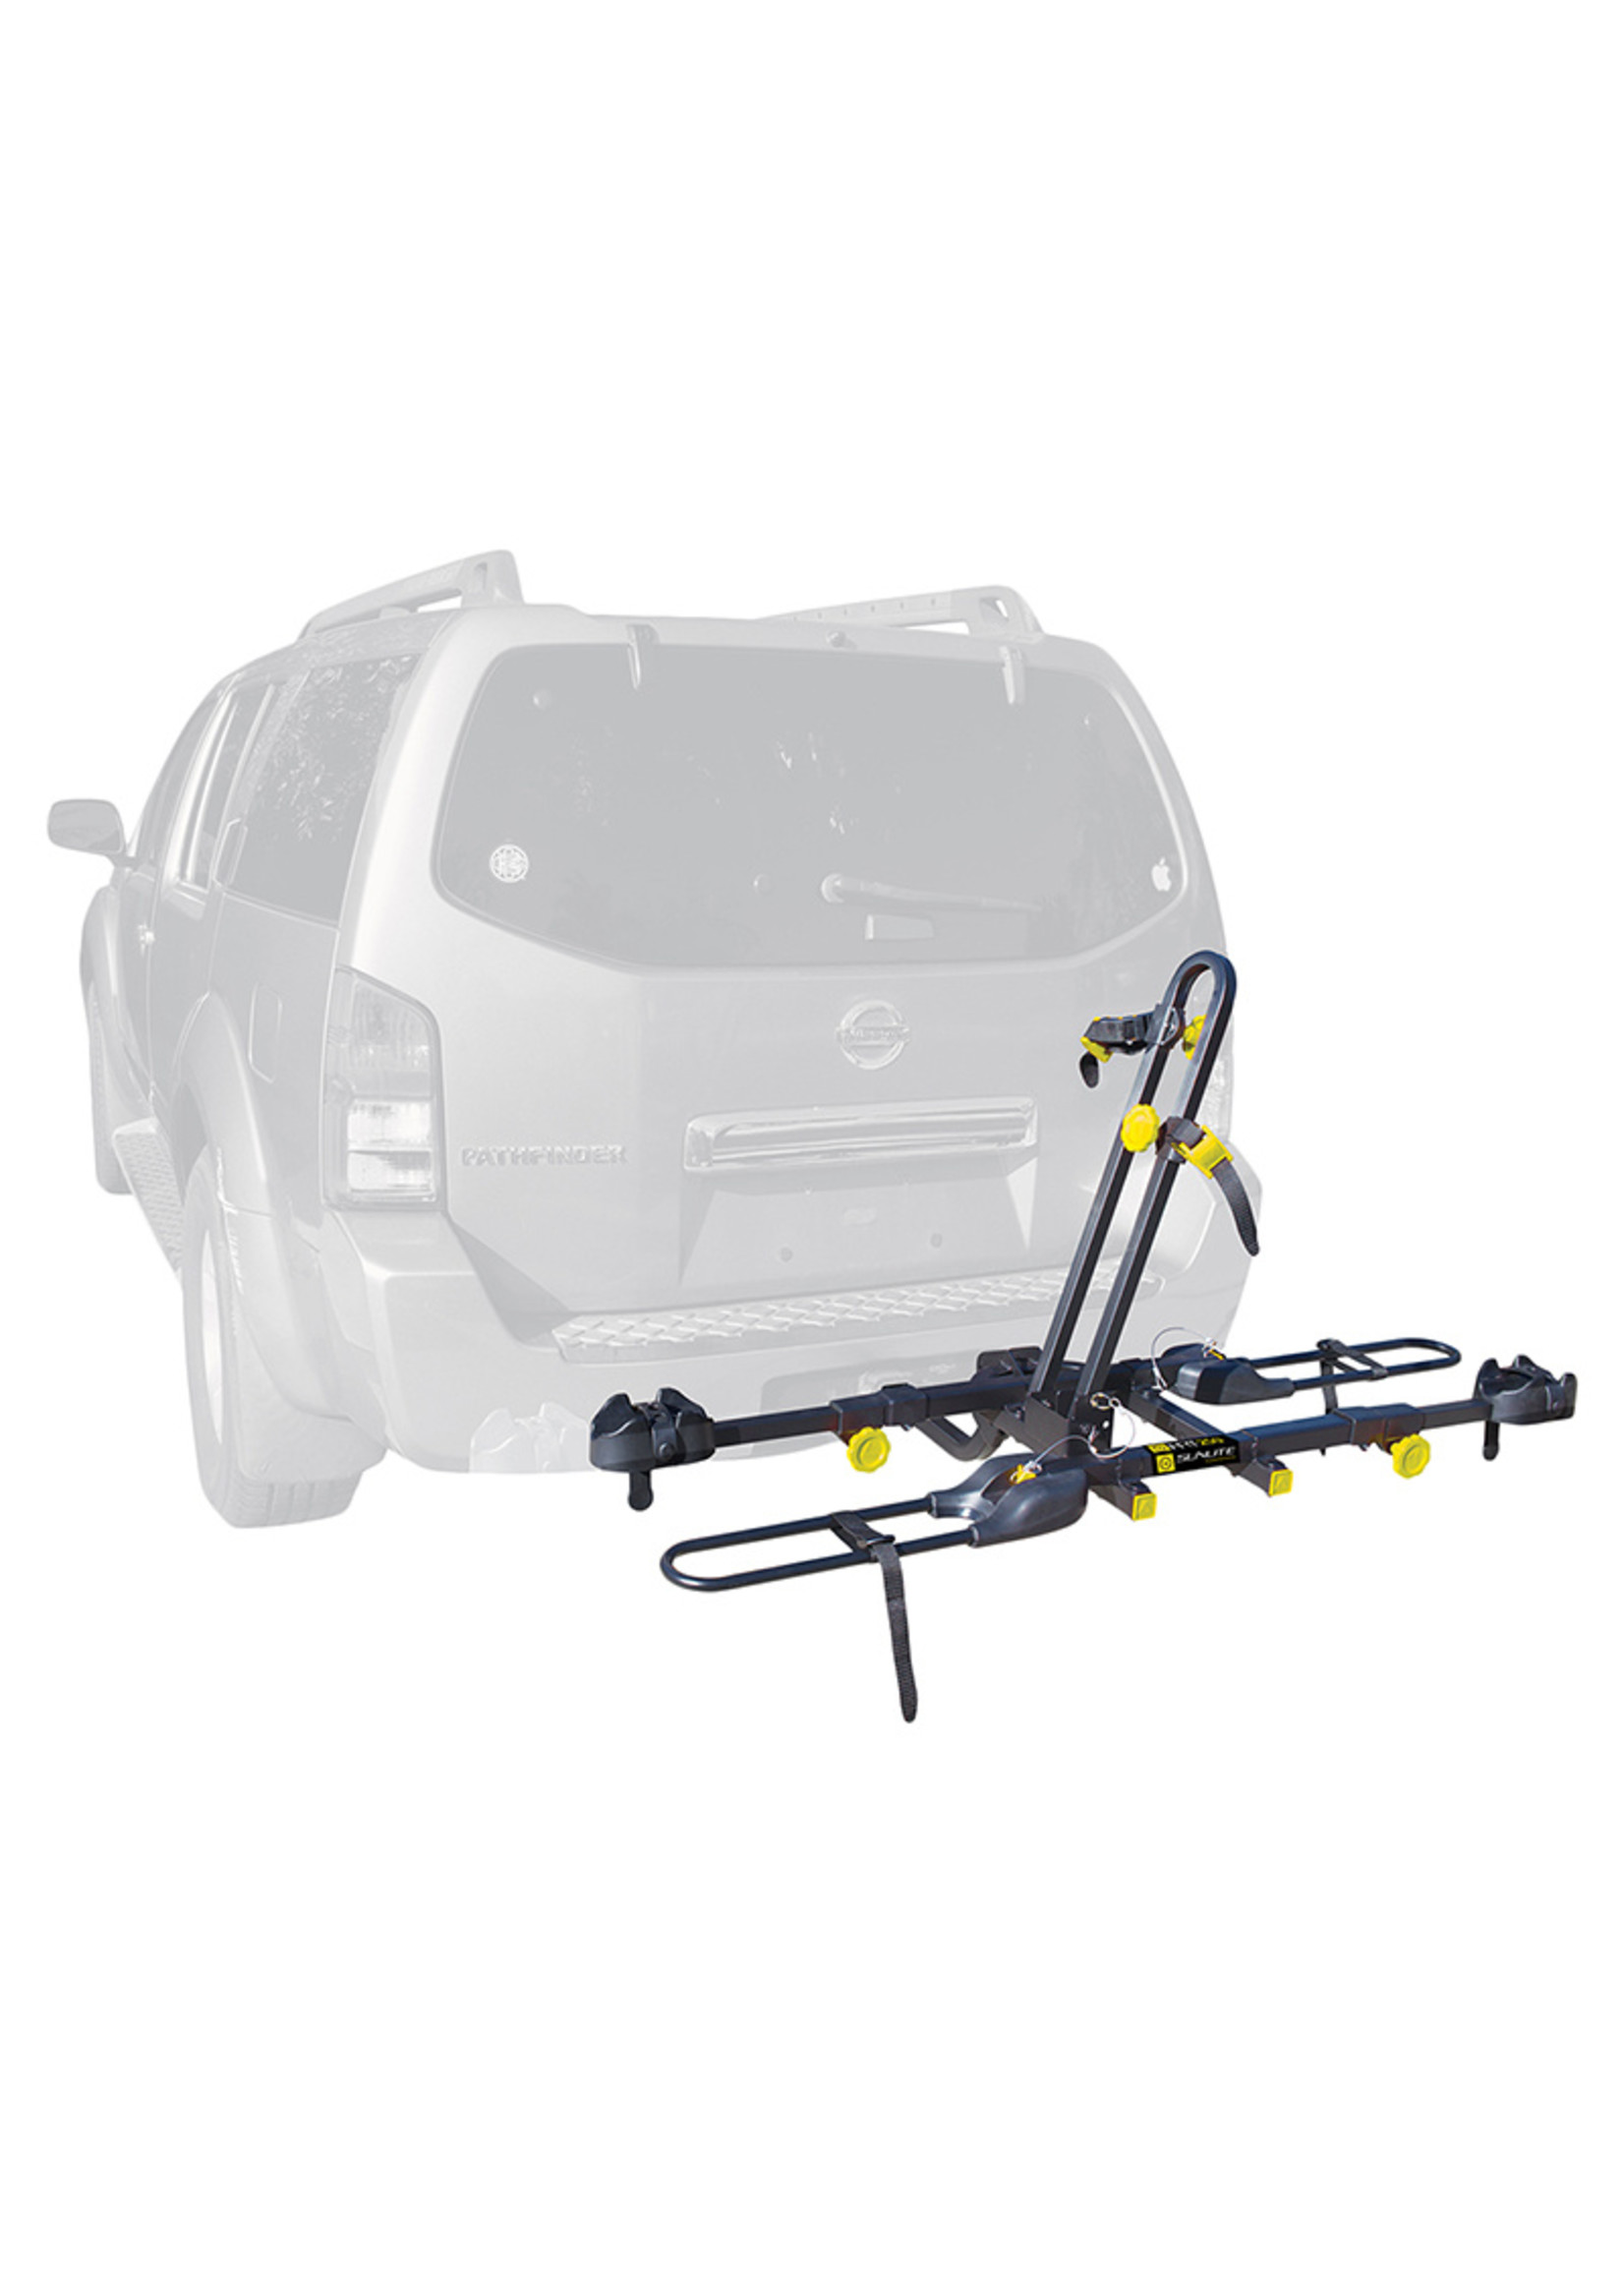 SUNLITE CAR RACK SUNLT HRT-250 SPORT TRAY 2B 1.25-2in